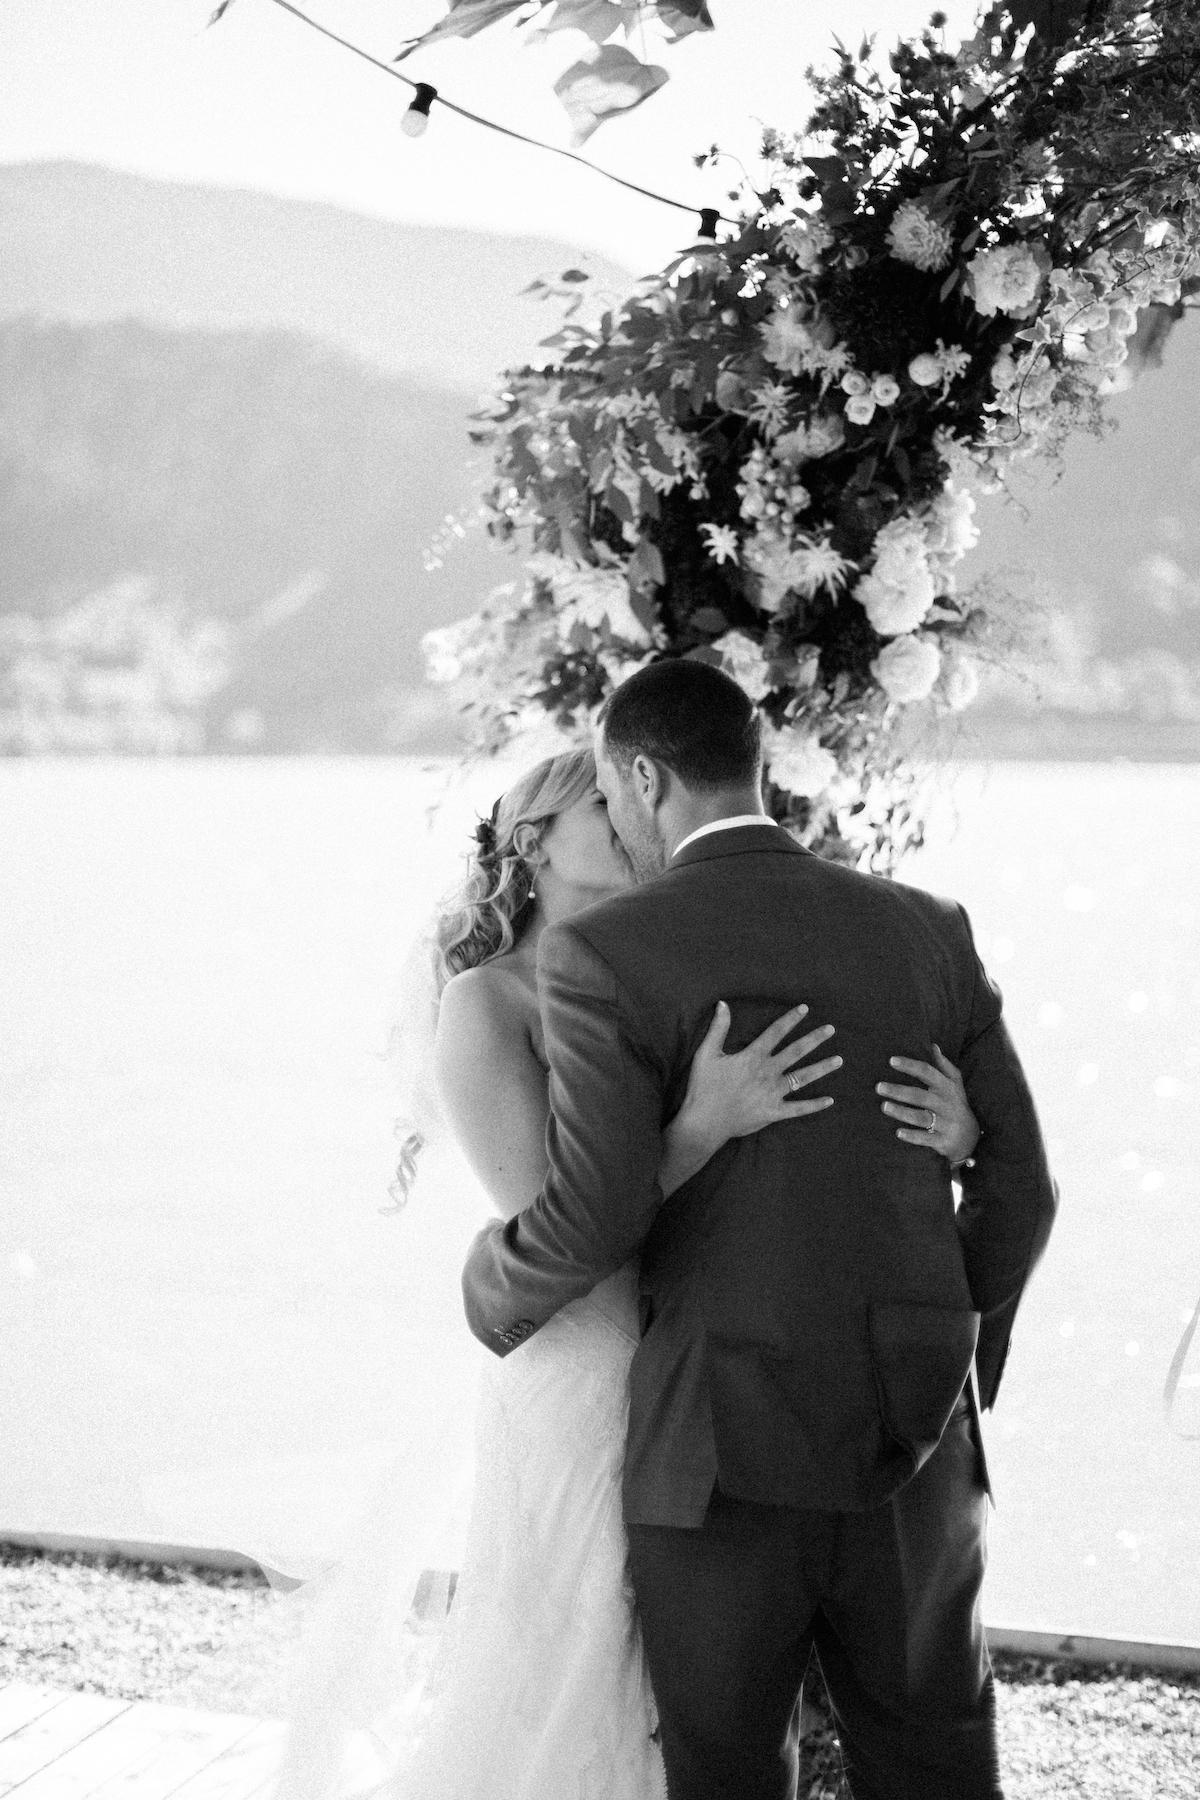 annecy-wedding-photos-138.jpg